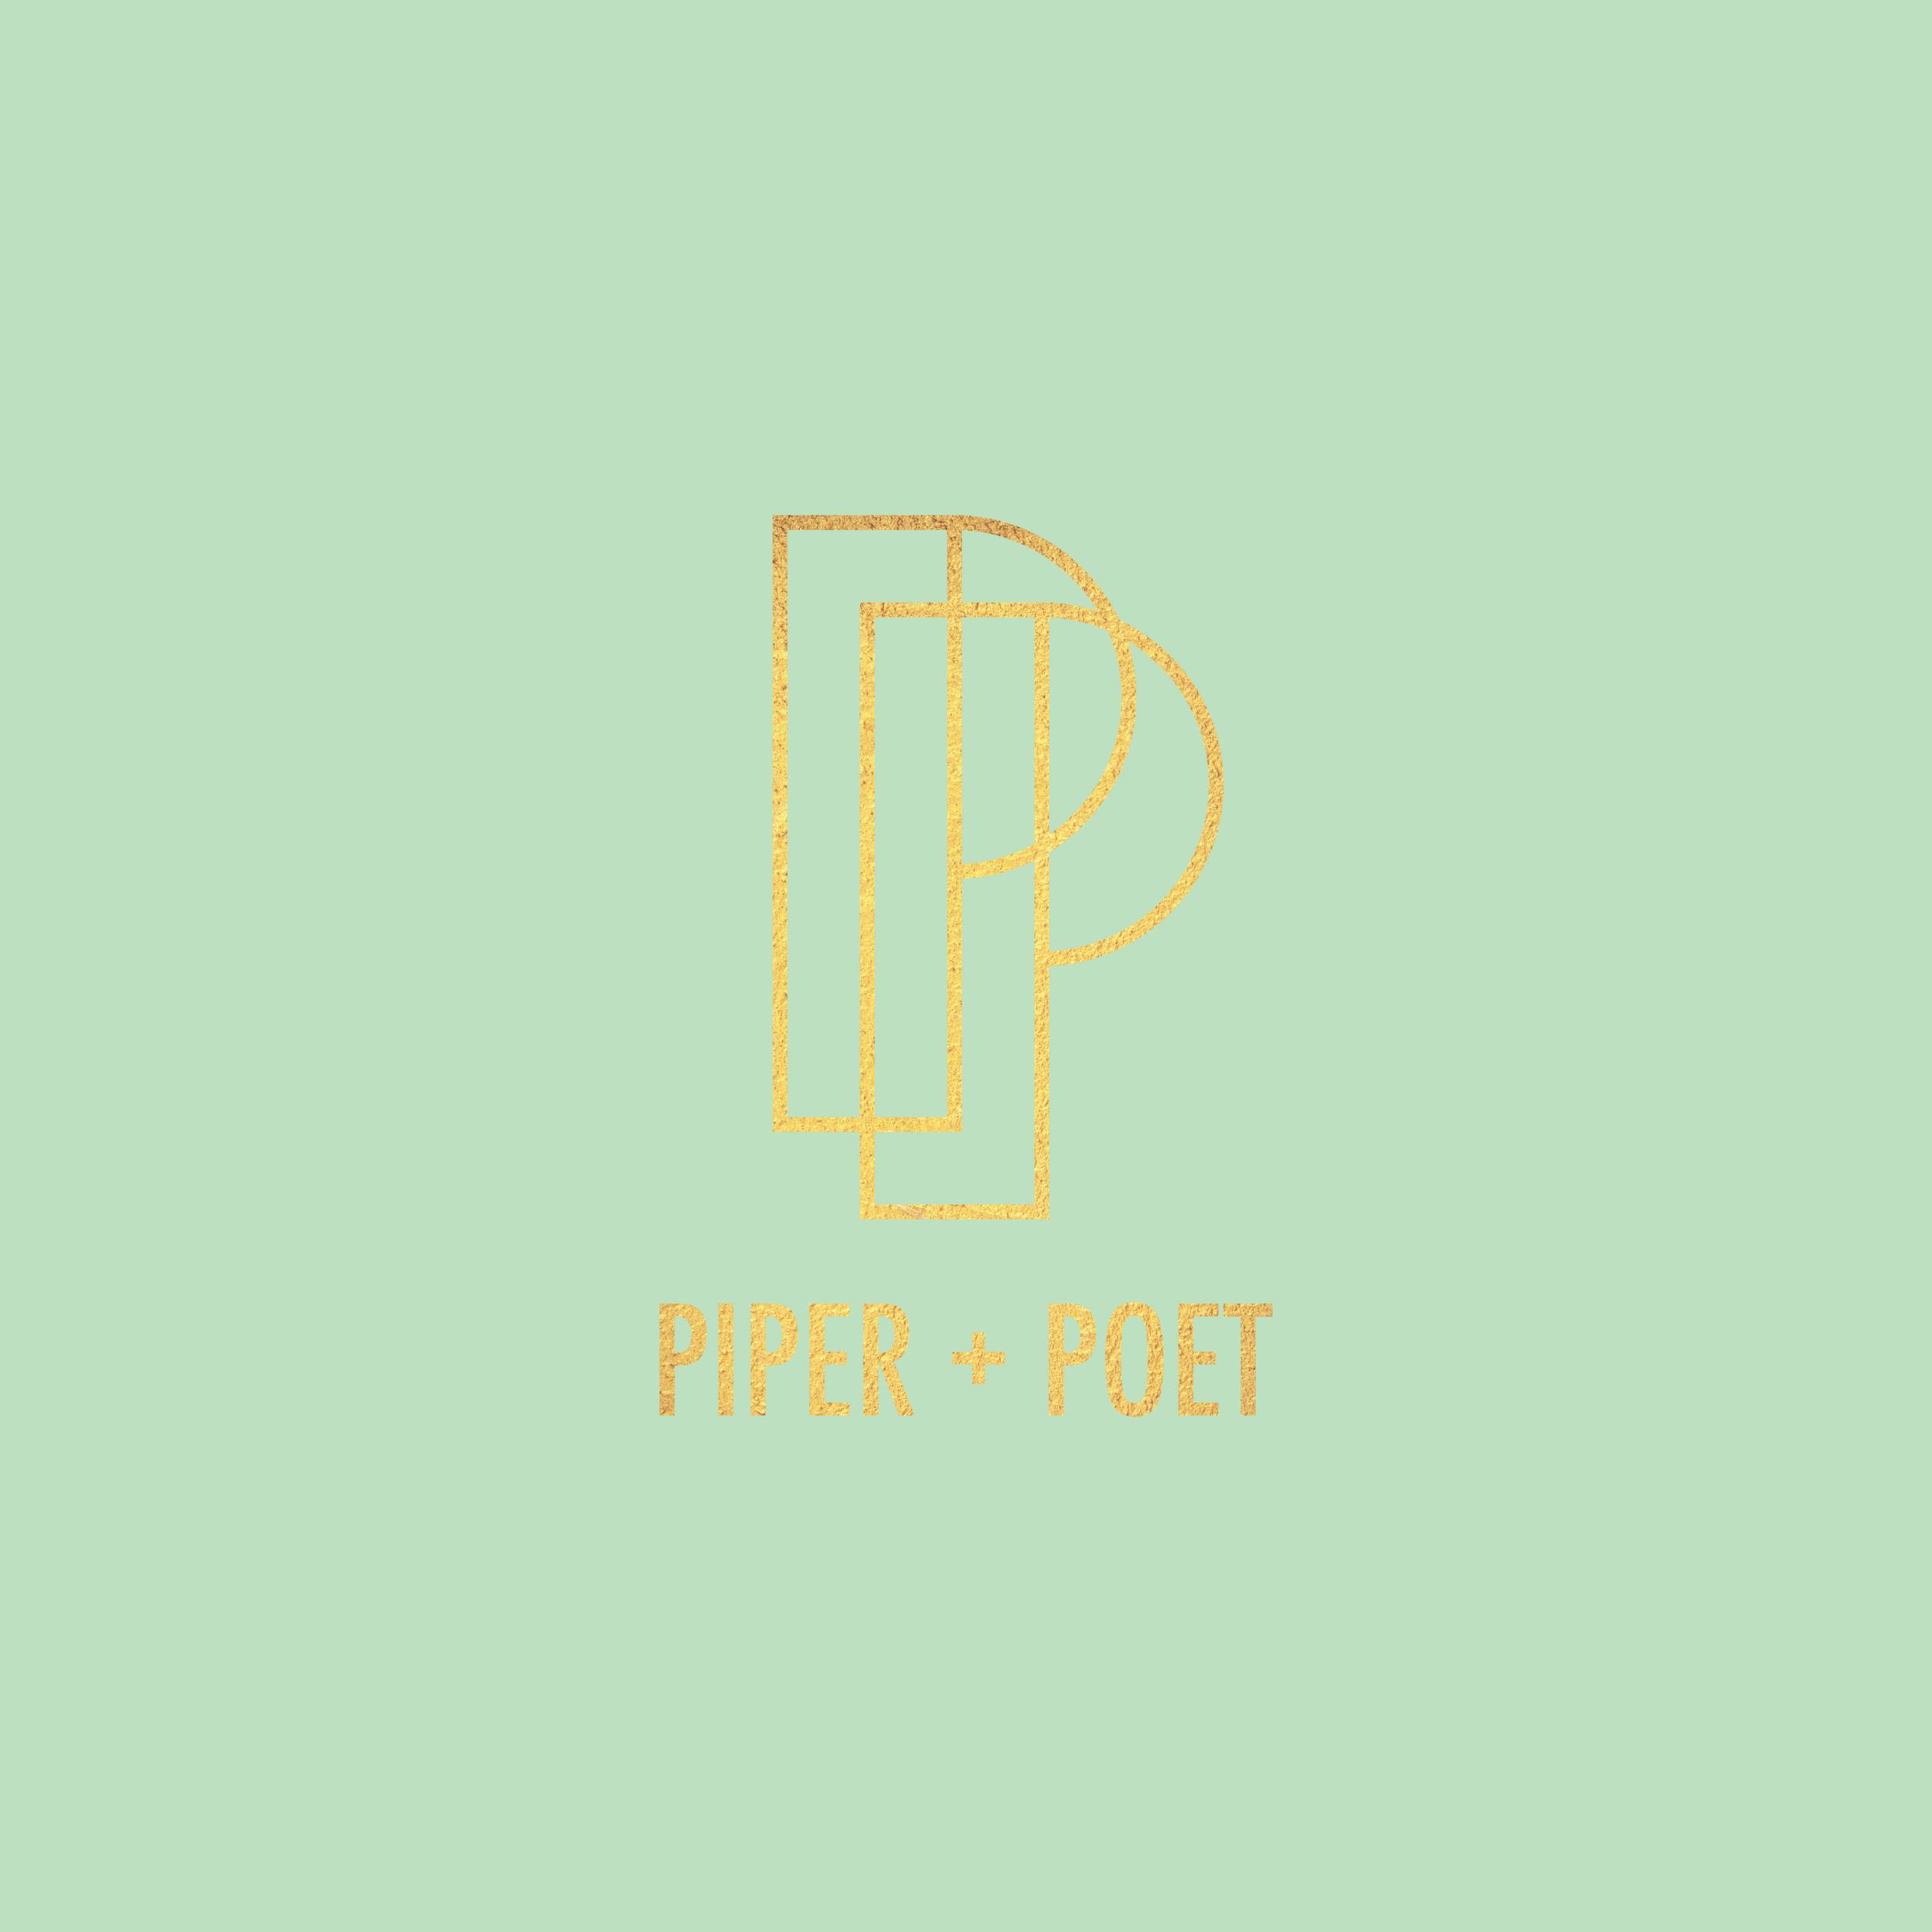 mariettaderlanger-piperandpoet-plus-logo.png